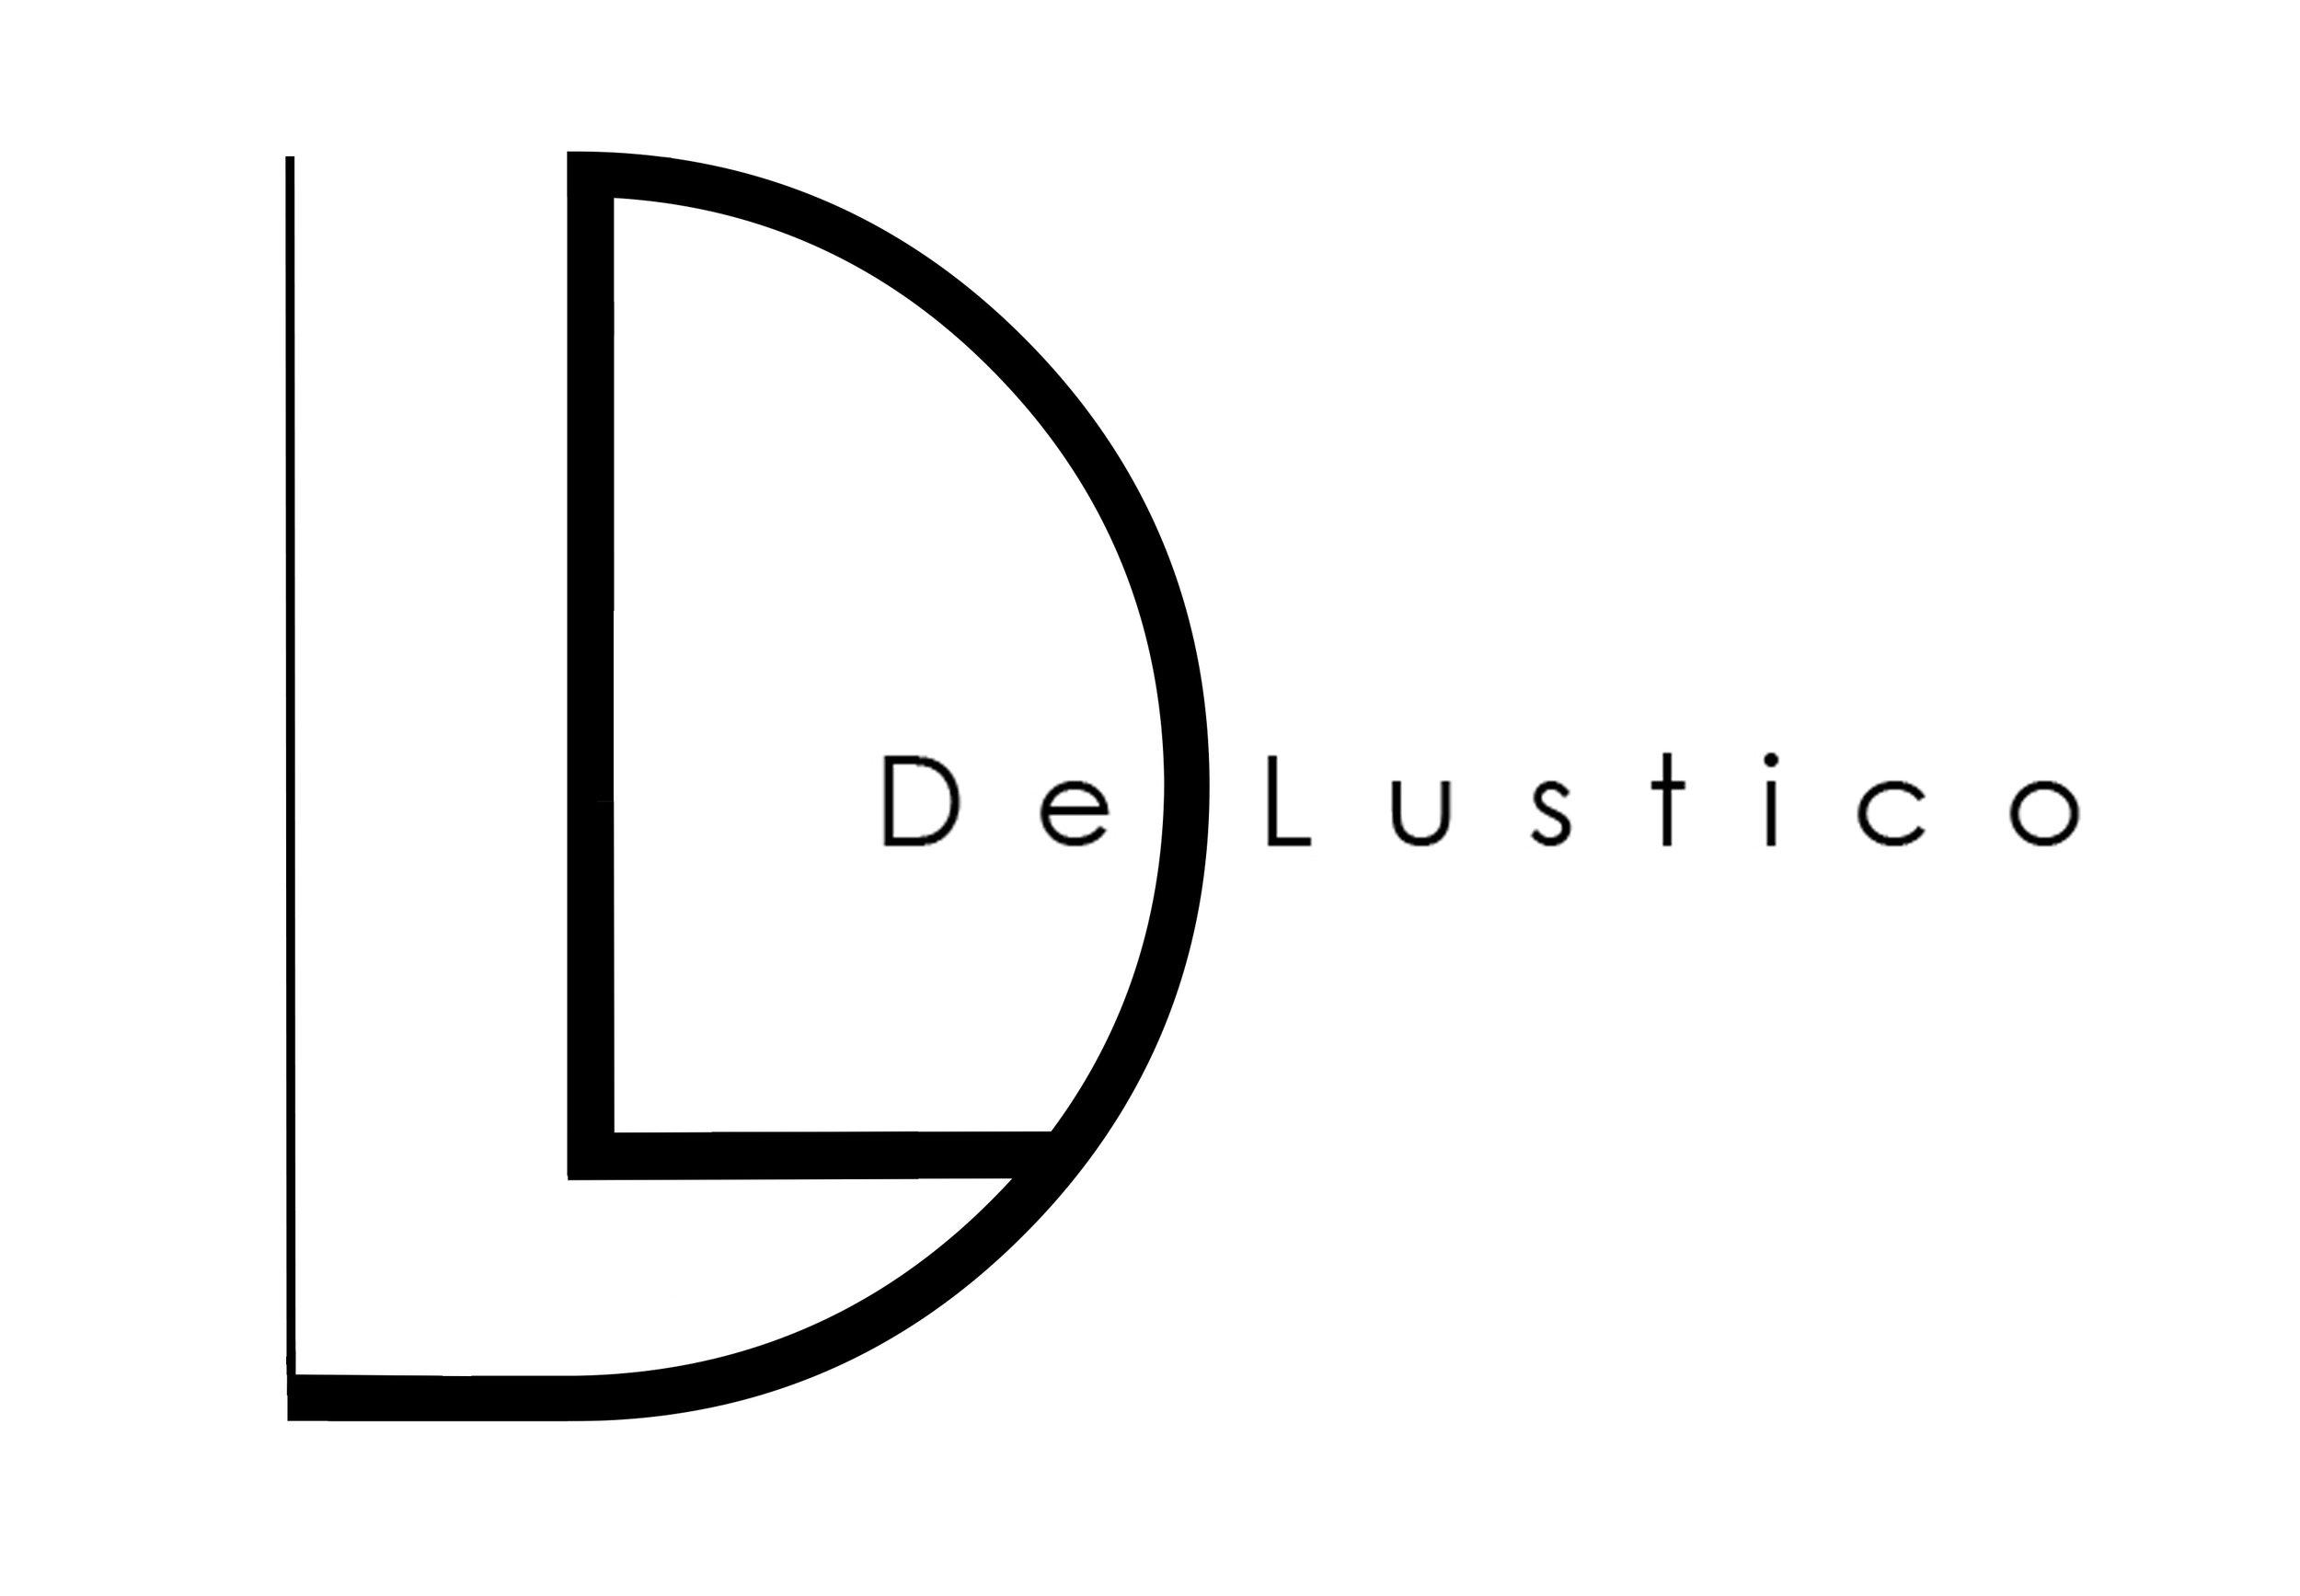 LOGO-DeLustico.jpg